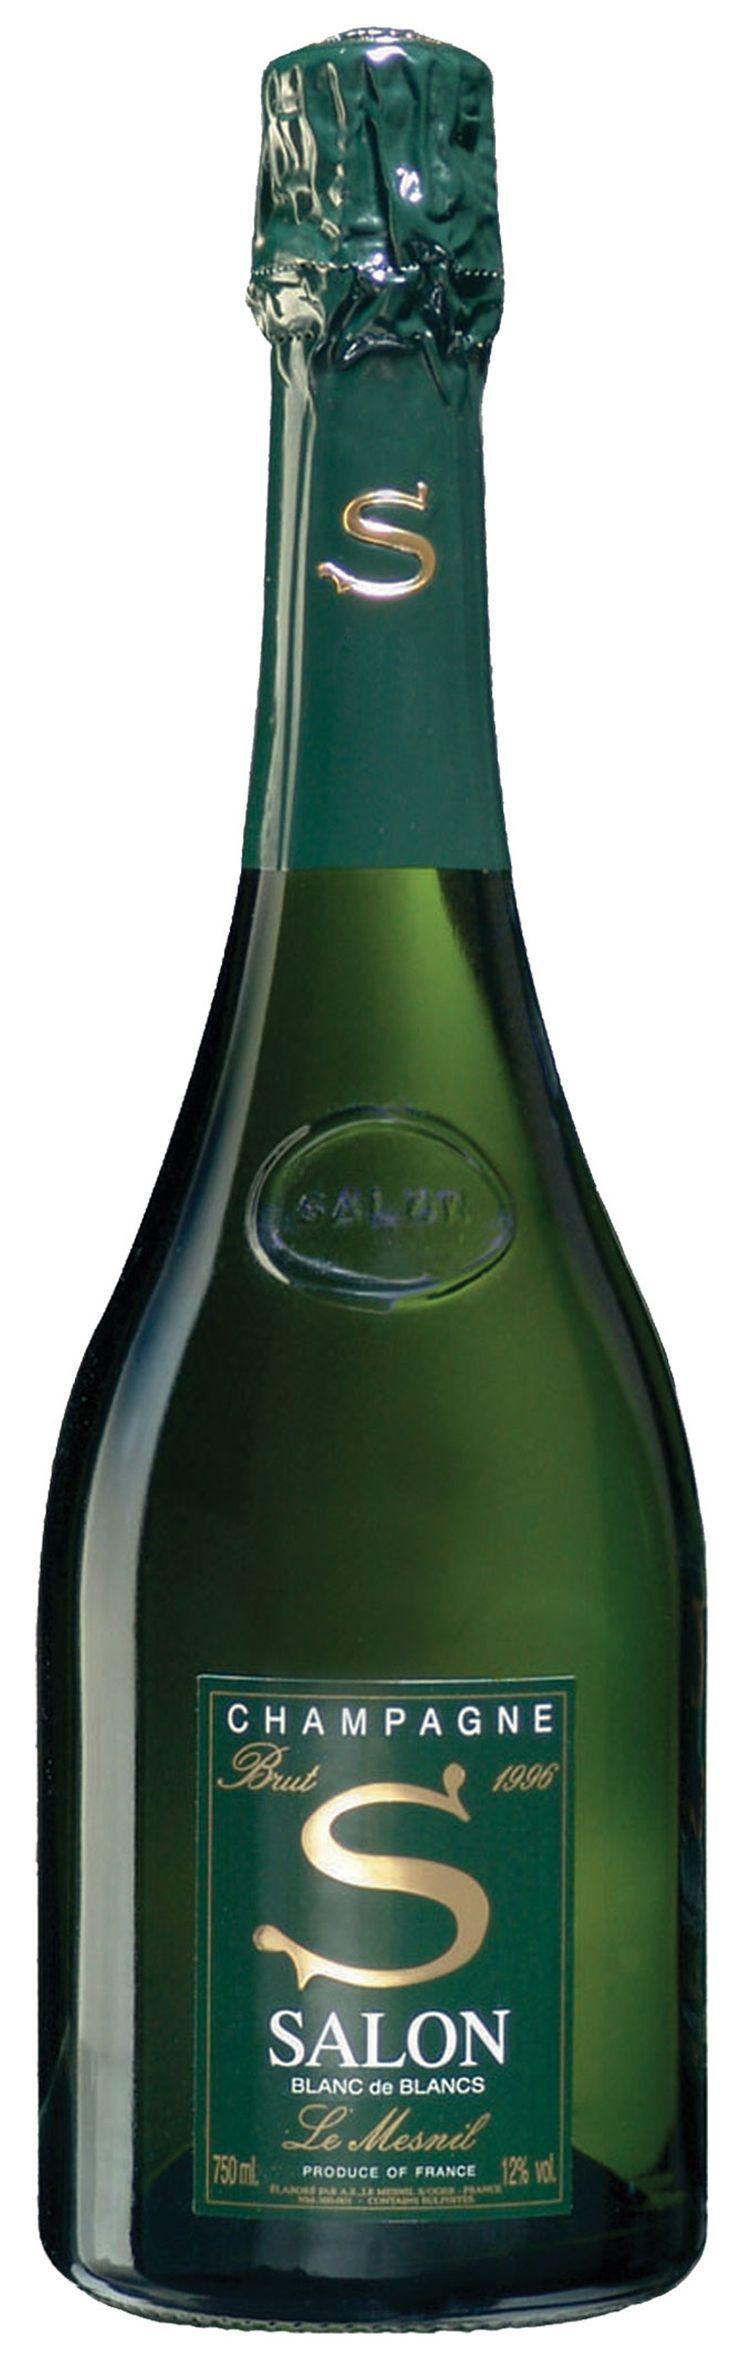 """A bottle of Salon le Mesnil Blanc de Blanc Champagne sent me straight to sparkling-wine heaven..."""